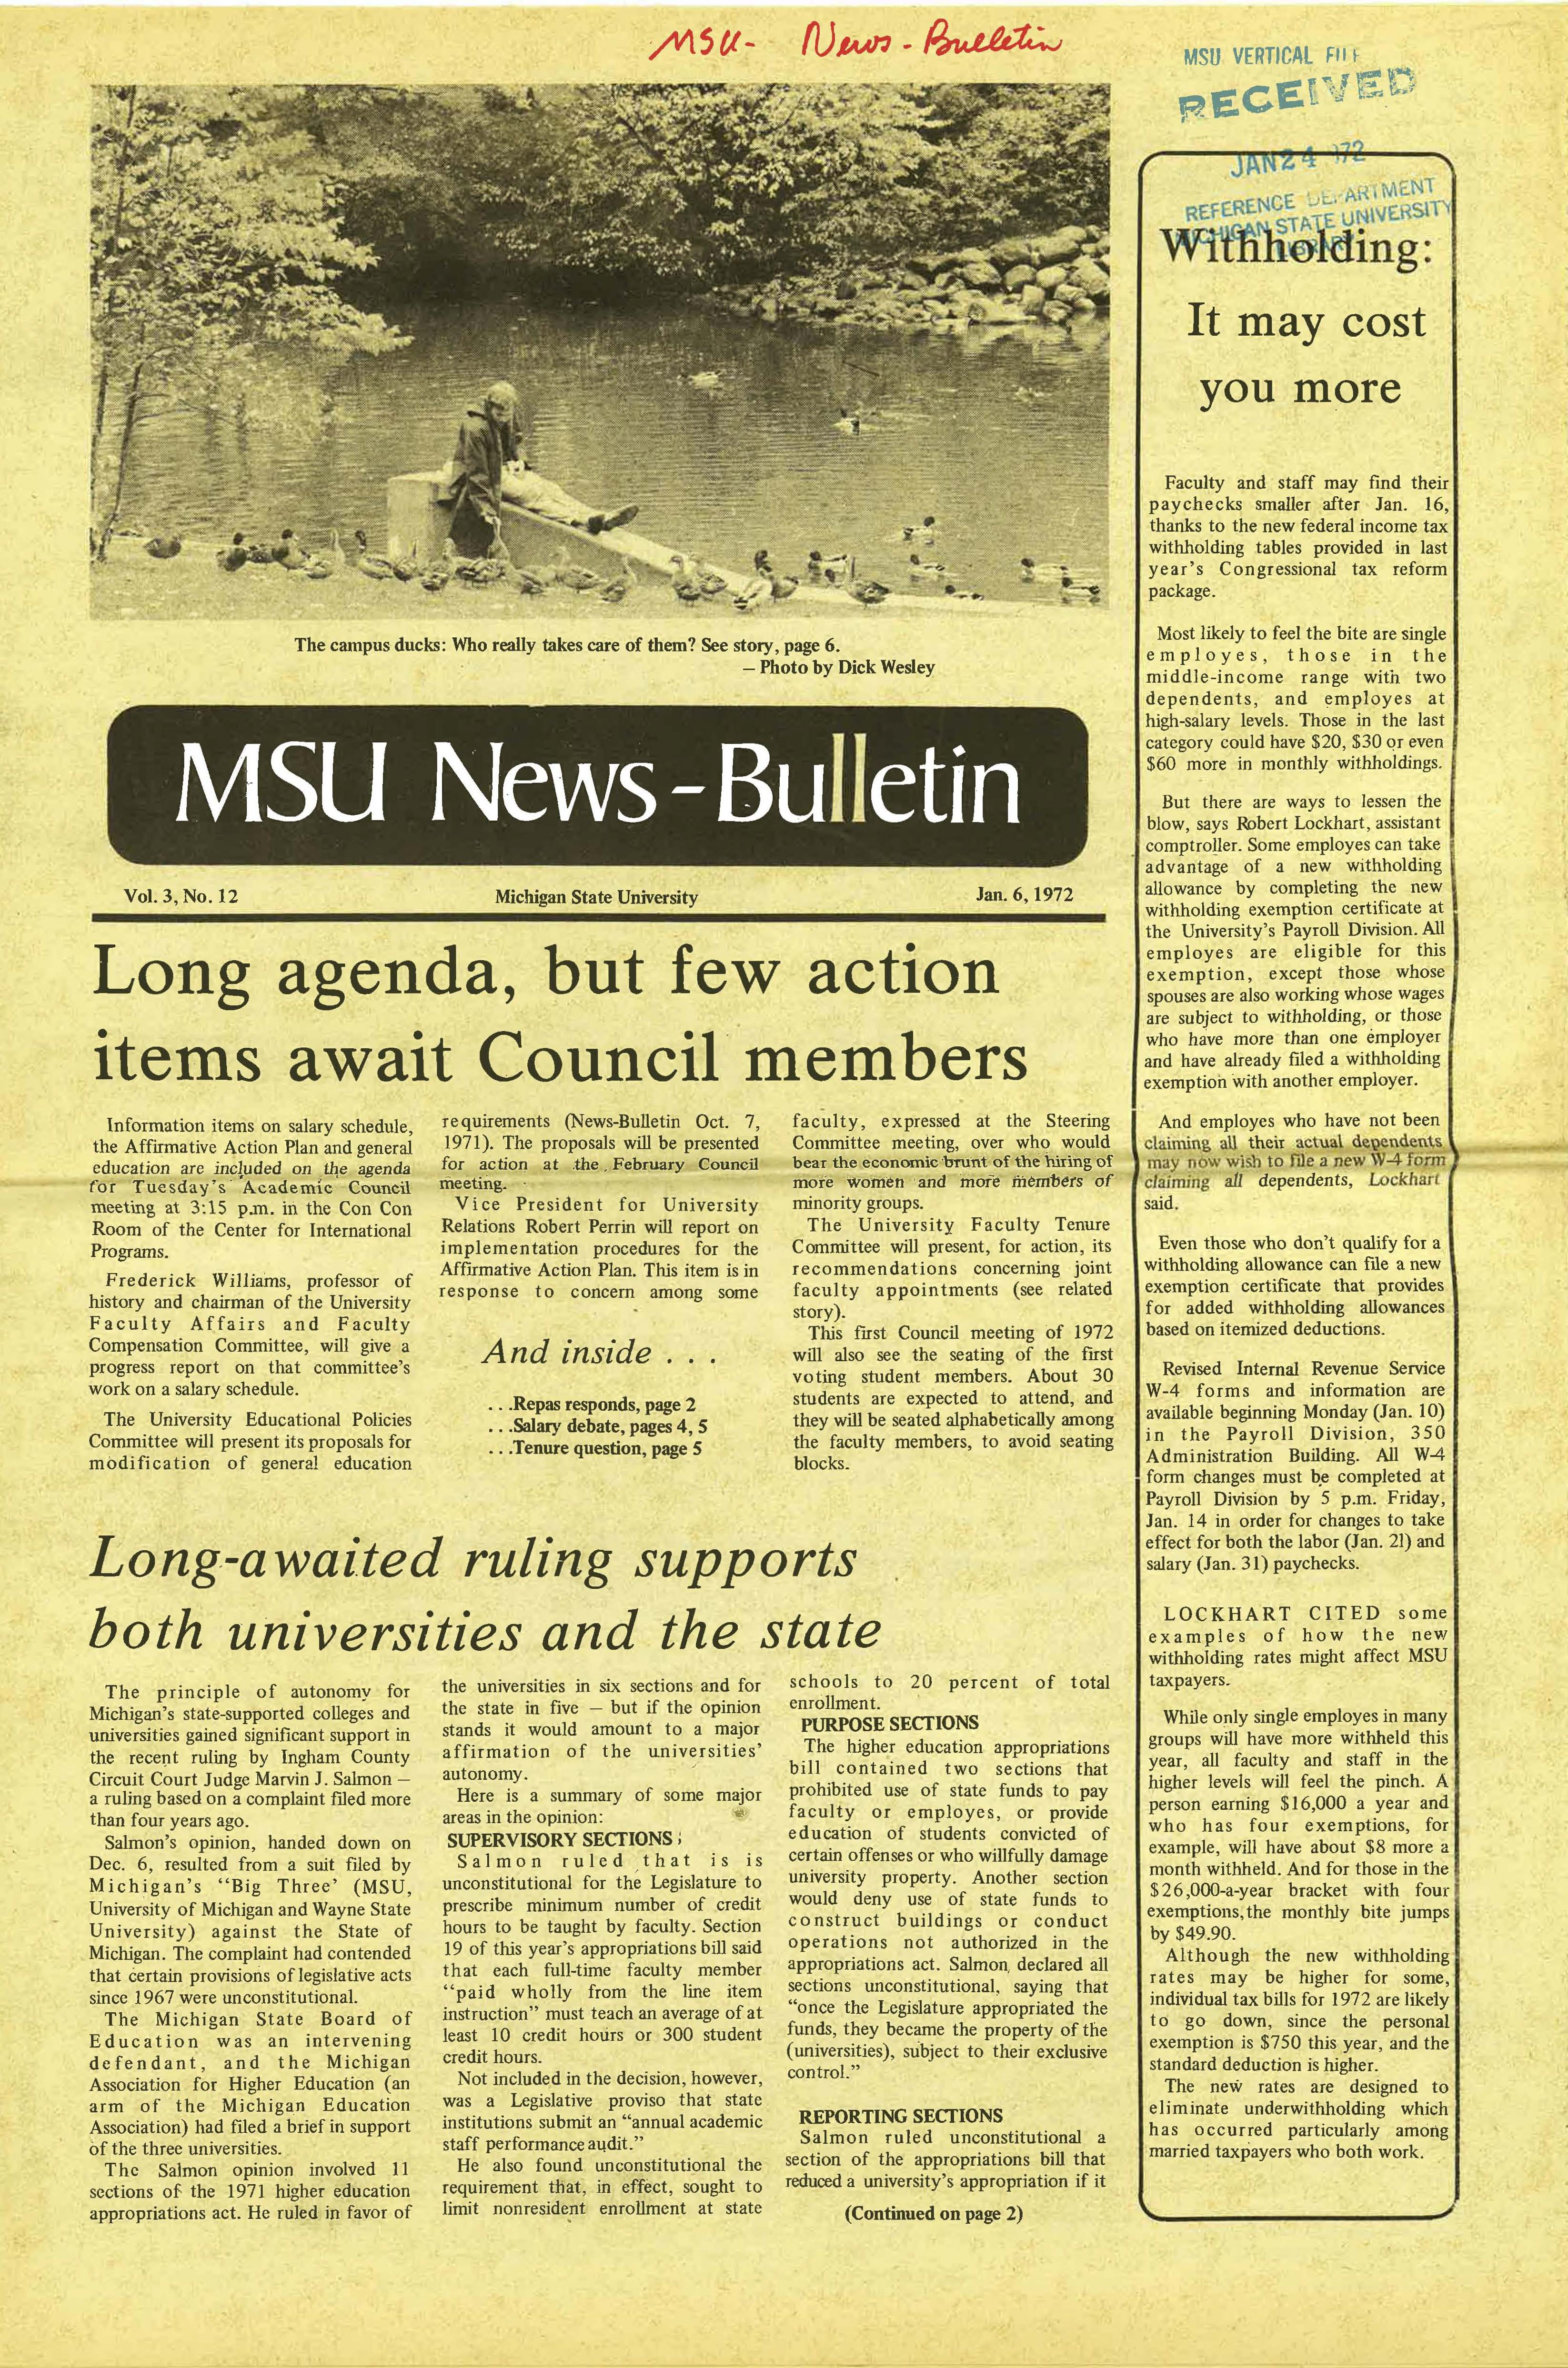 MSU News Bulletin, vol. 3, No. 36, August 10, 1972